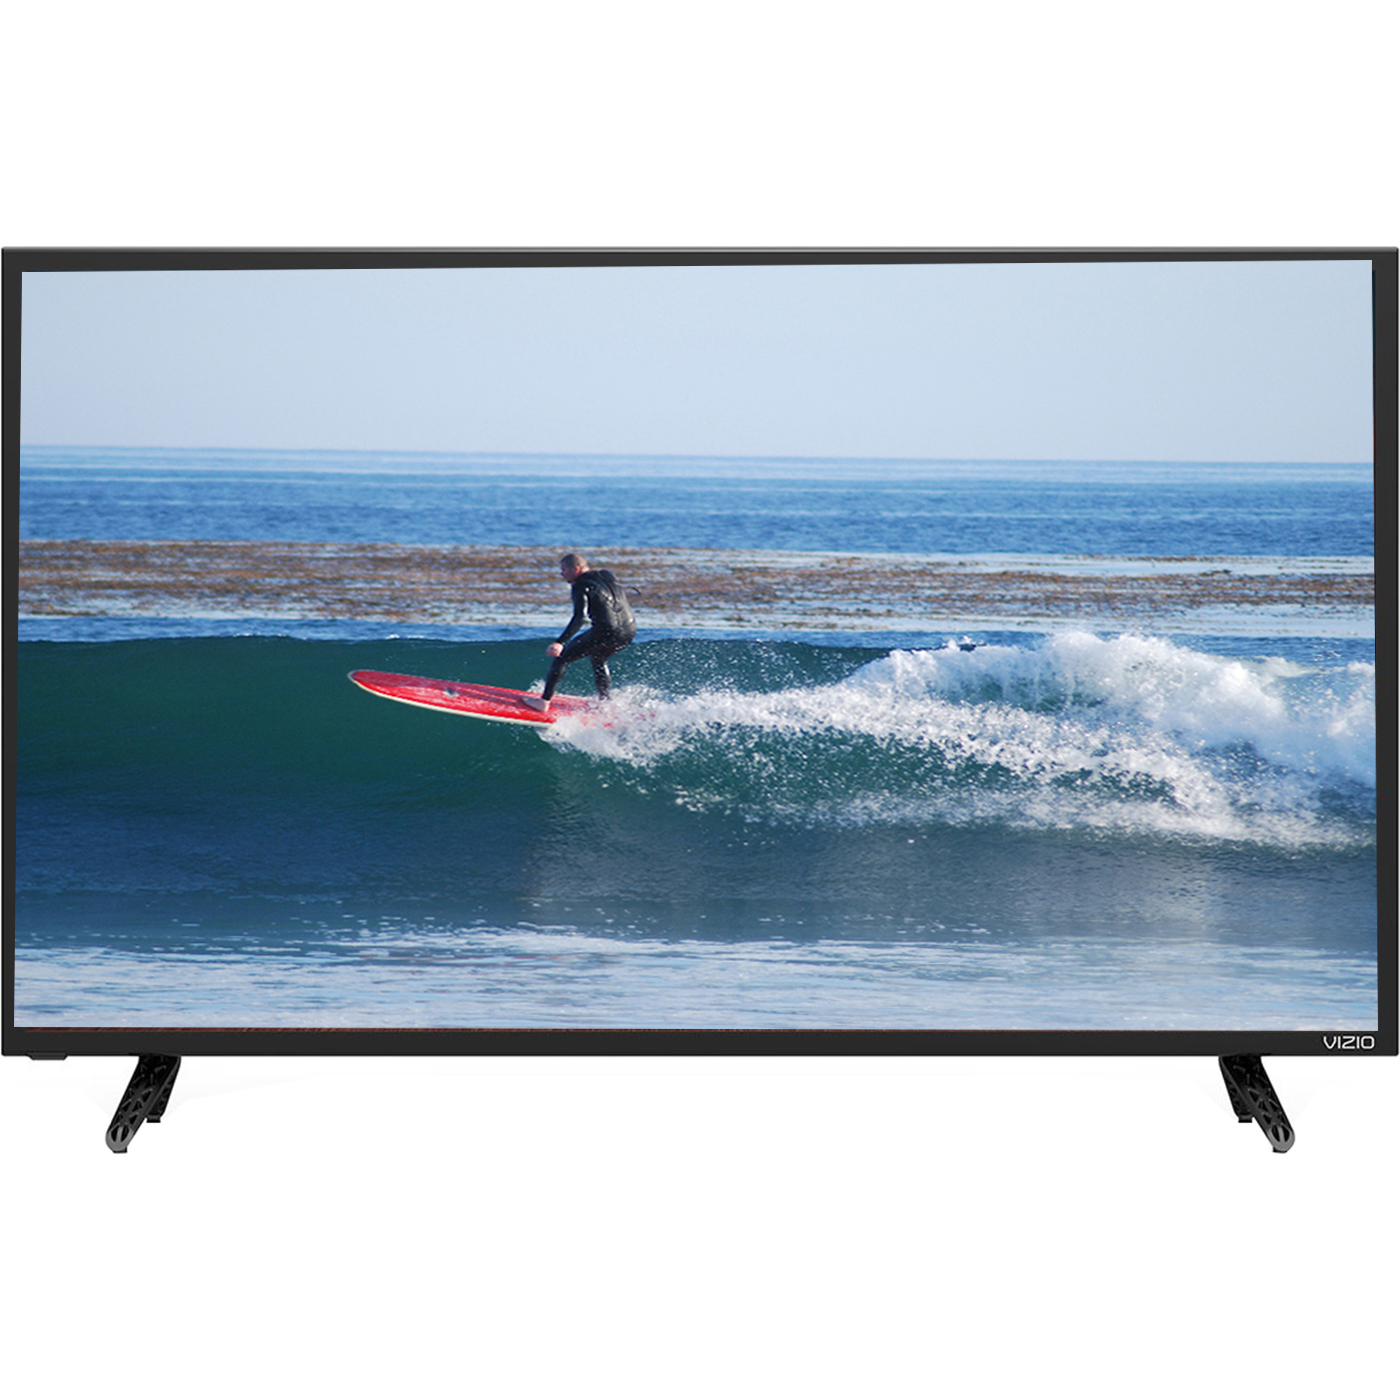 "Refurbished Vizio 32"" 1080p Smart LED TV, D32F-F"